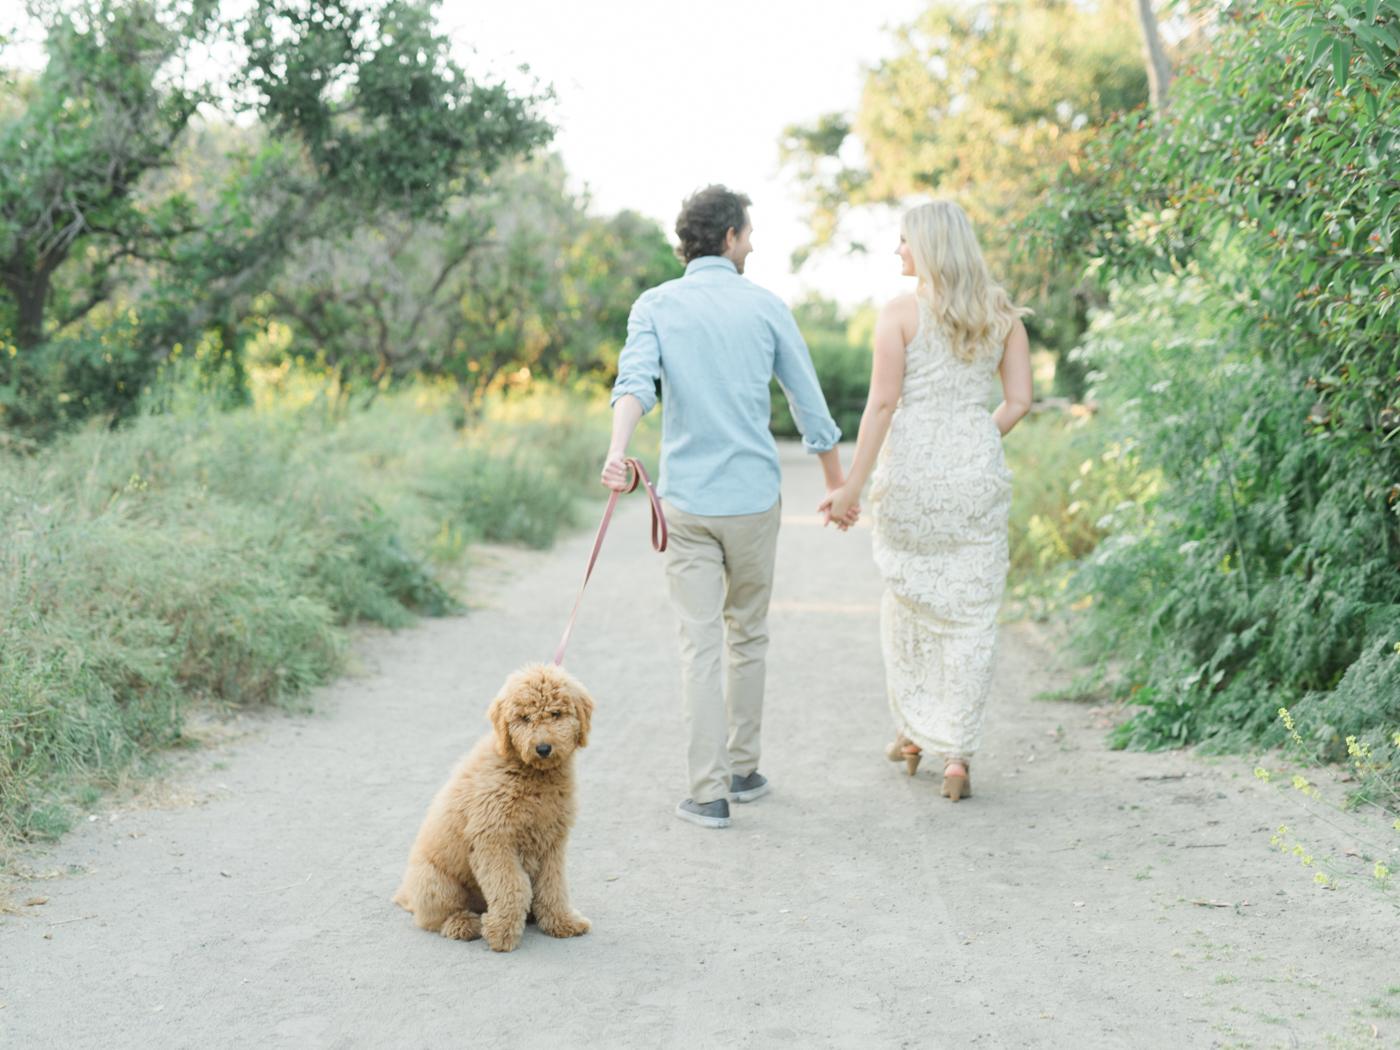 San_Juan_Capistrano_Goldendoodle_family_portrait_session_los_angeles_wedding_photographer-12.jpg